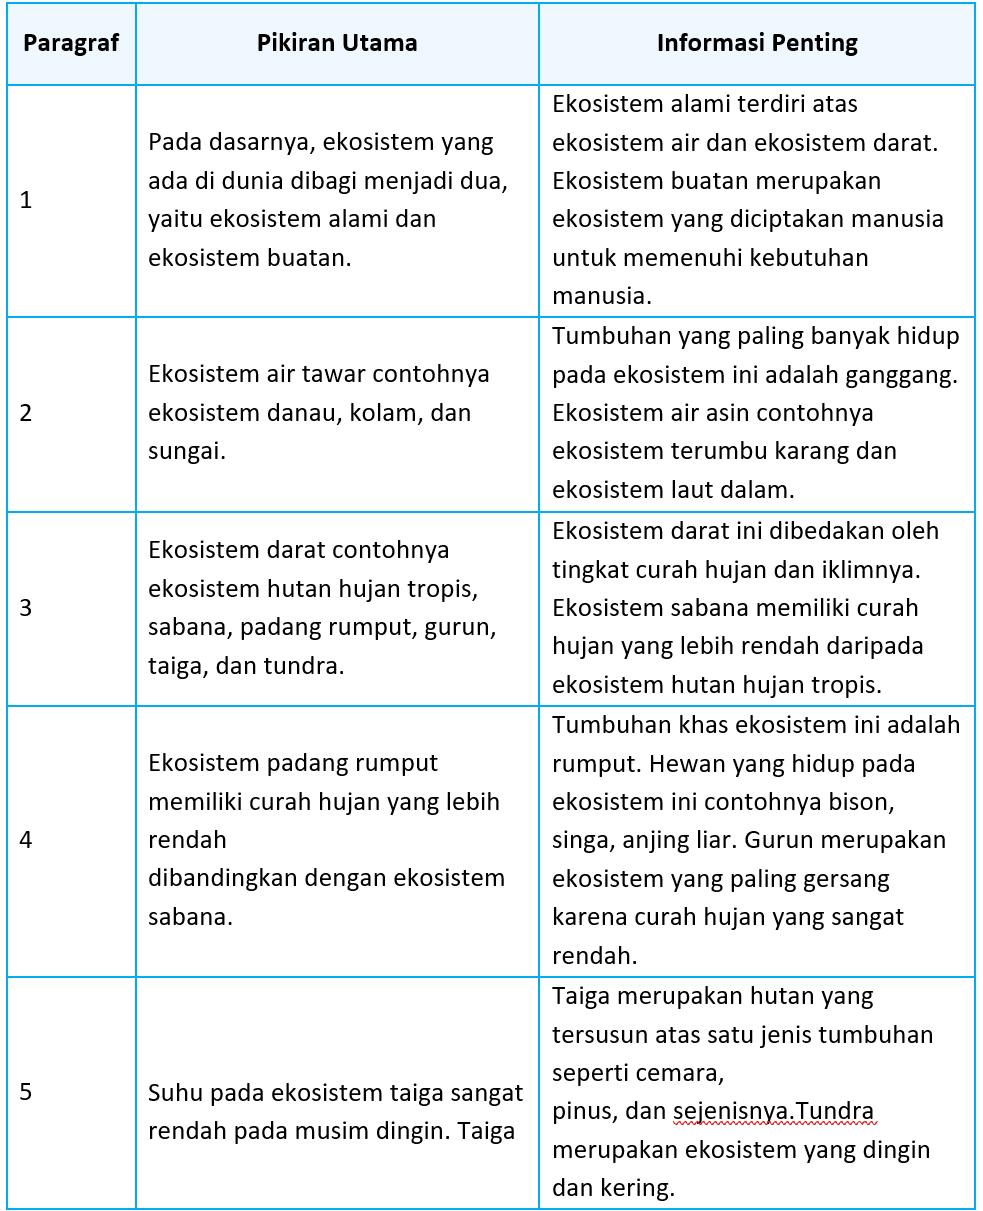 Kunci Jawaban Halaman 13, 15, 16, 17, 18 Tema 5 Kelas 5